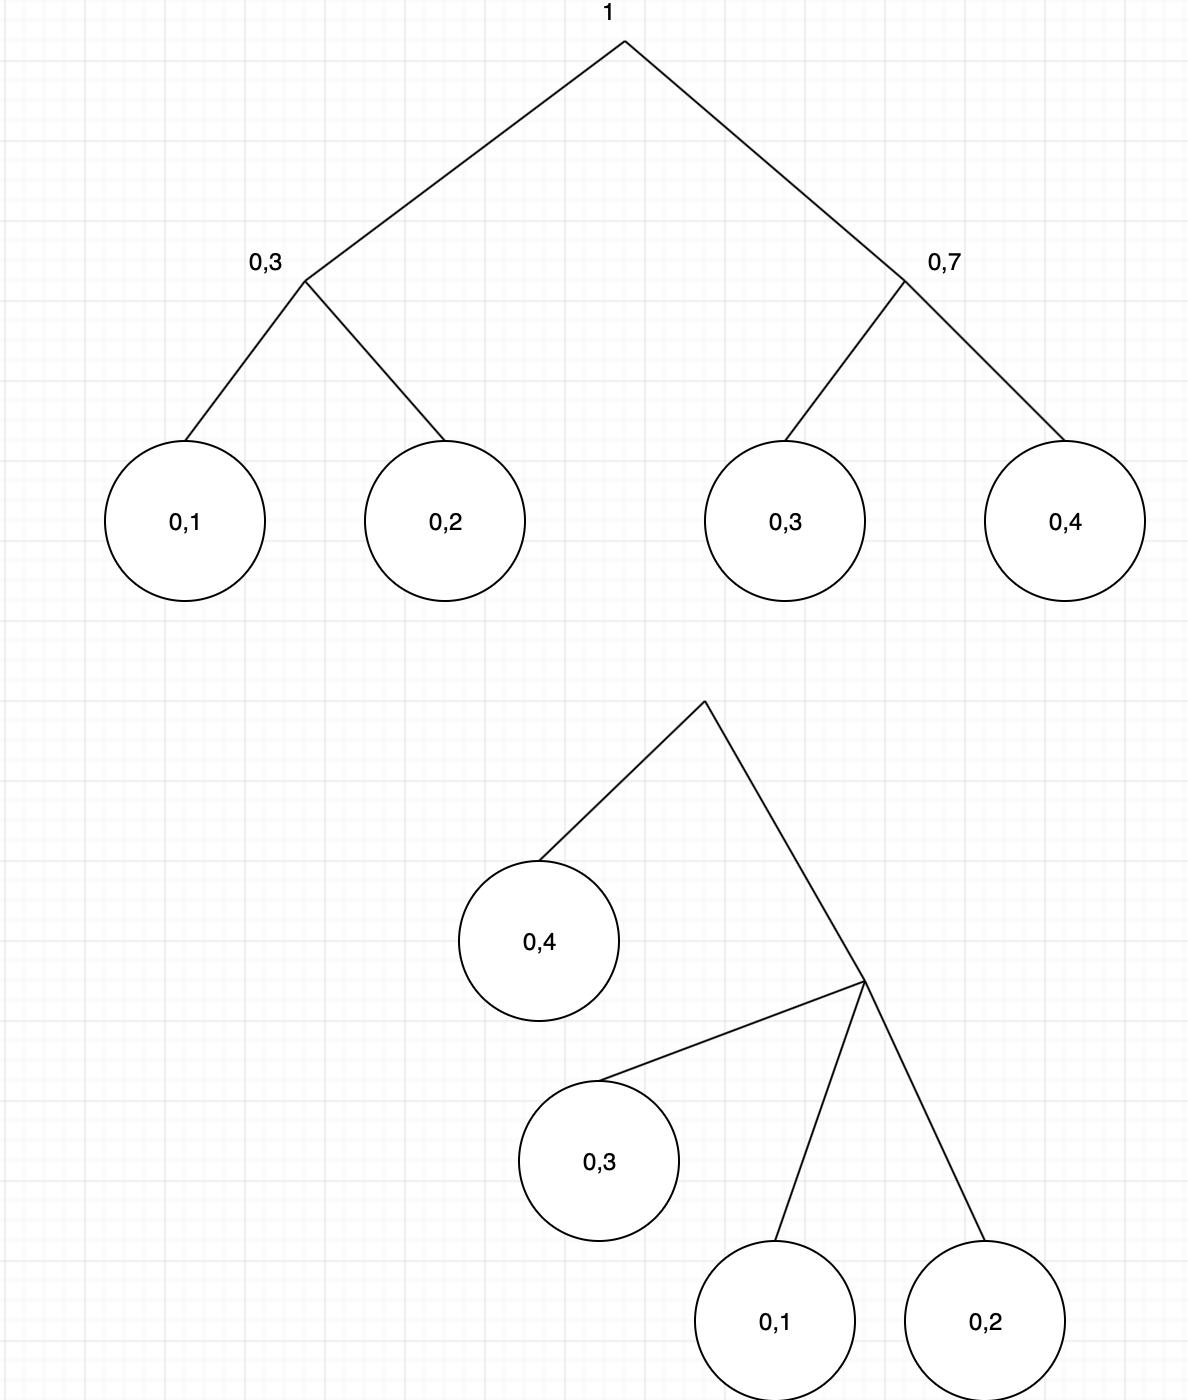 Huffman Encoding Symbols With Same Probability